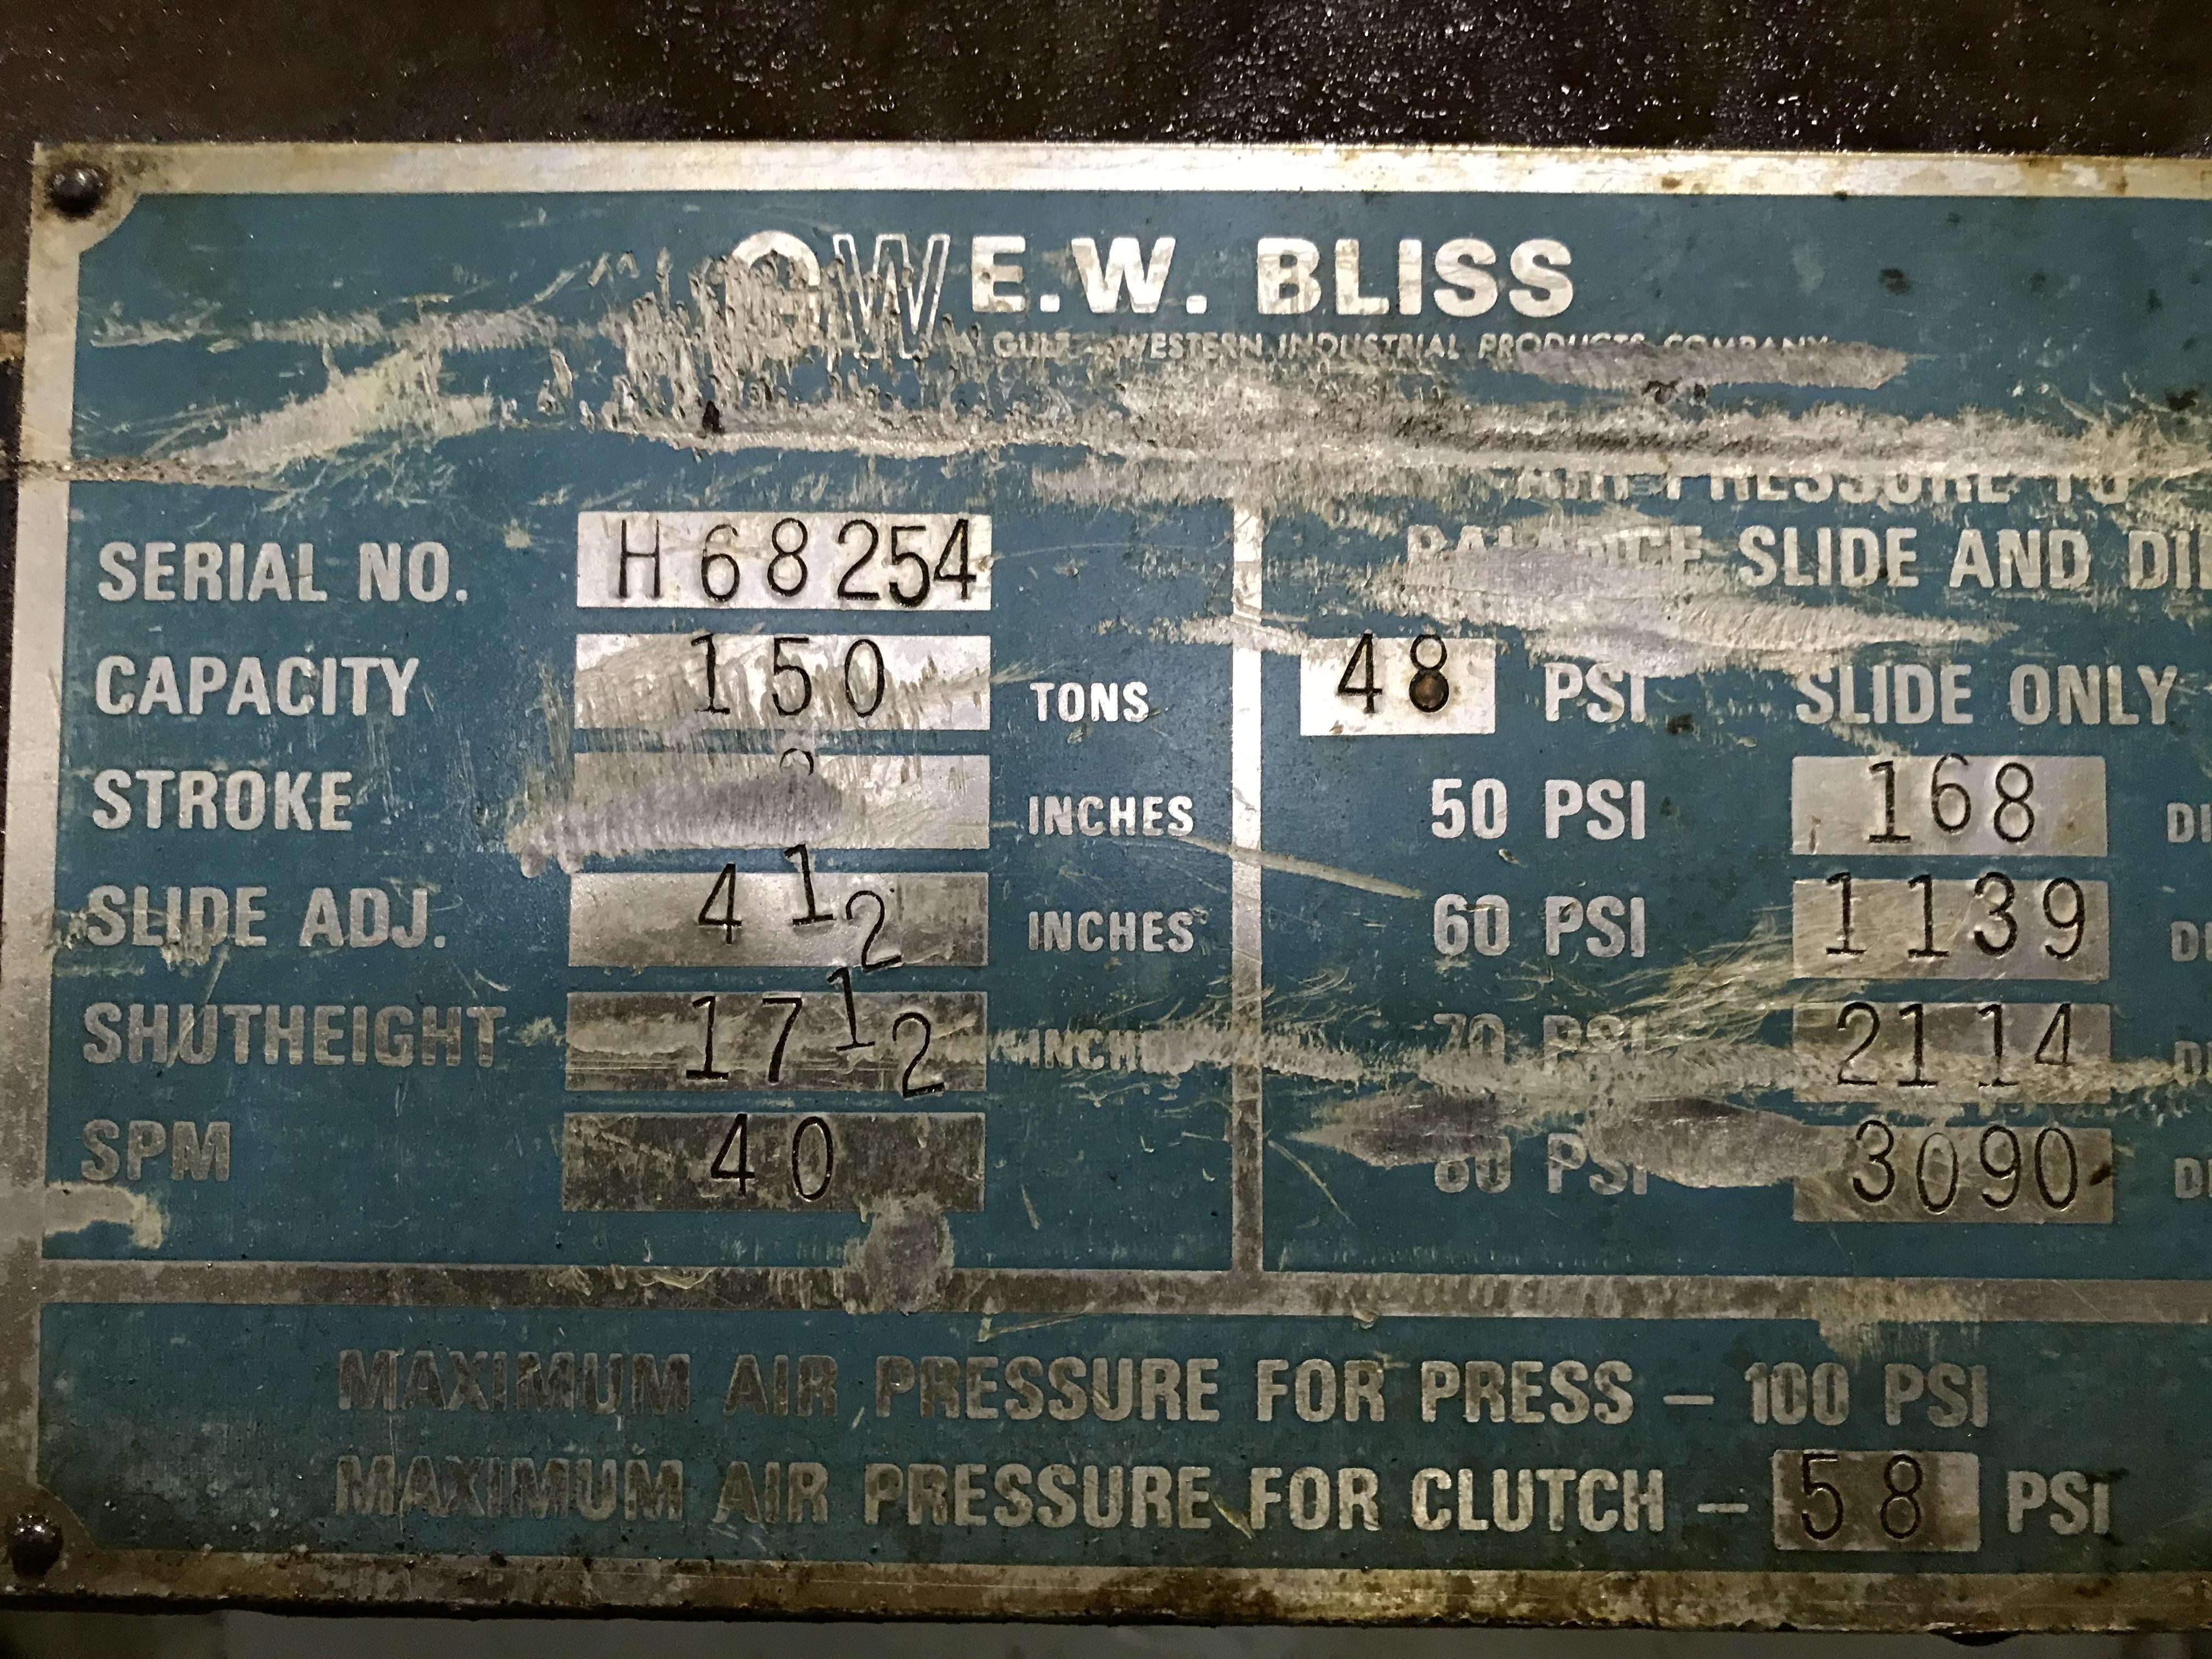 Bliss C-150 SN H68254 [DP1558] D